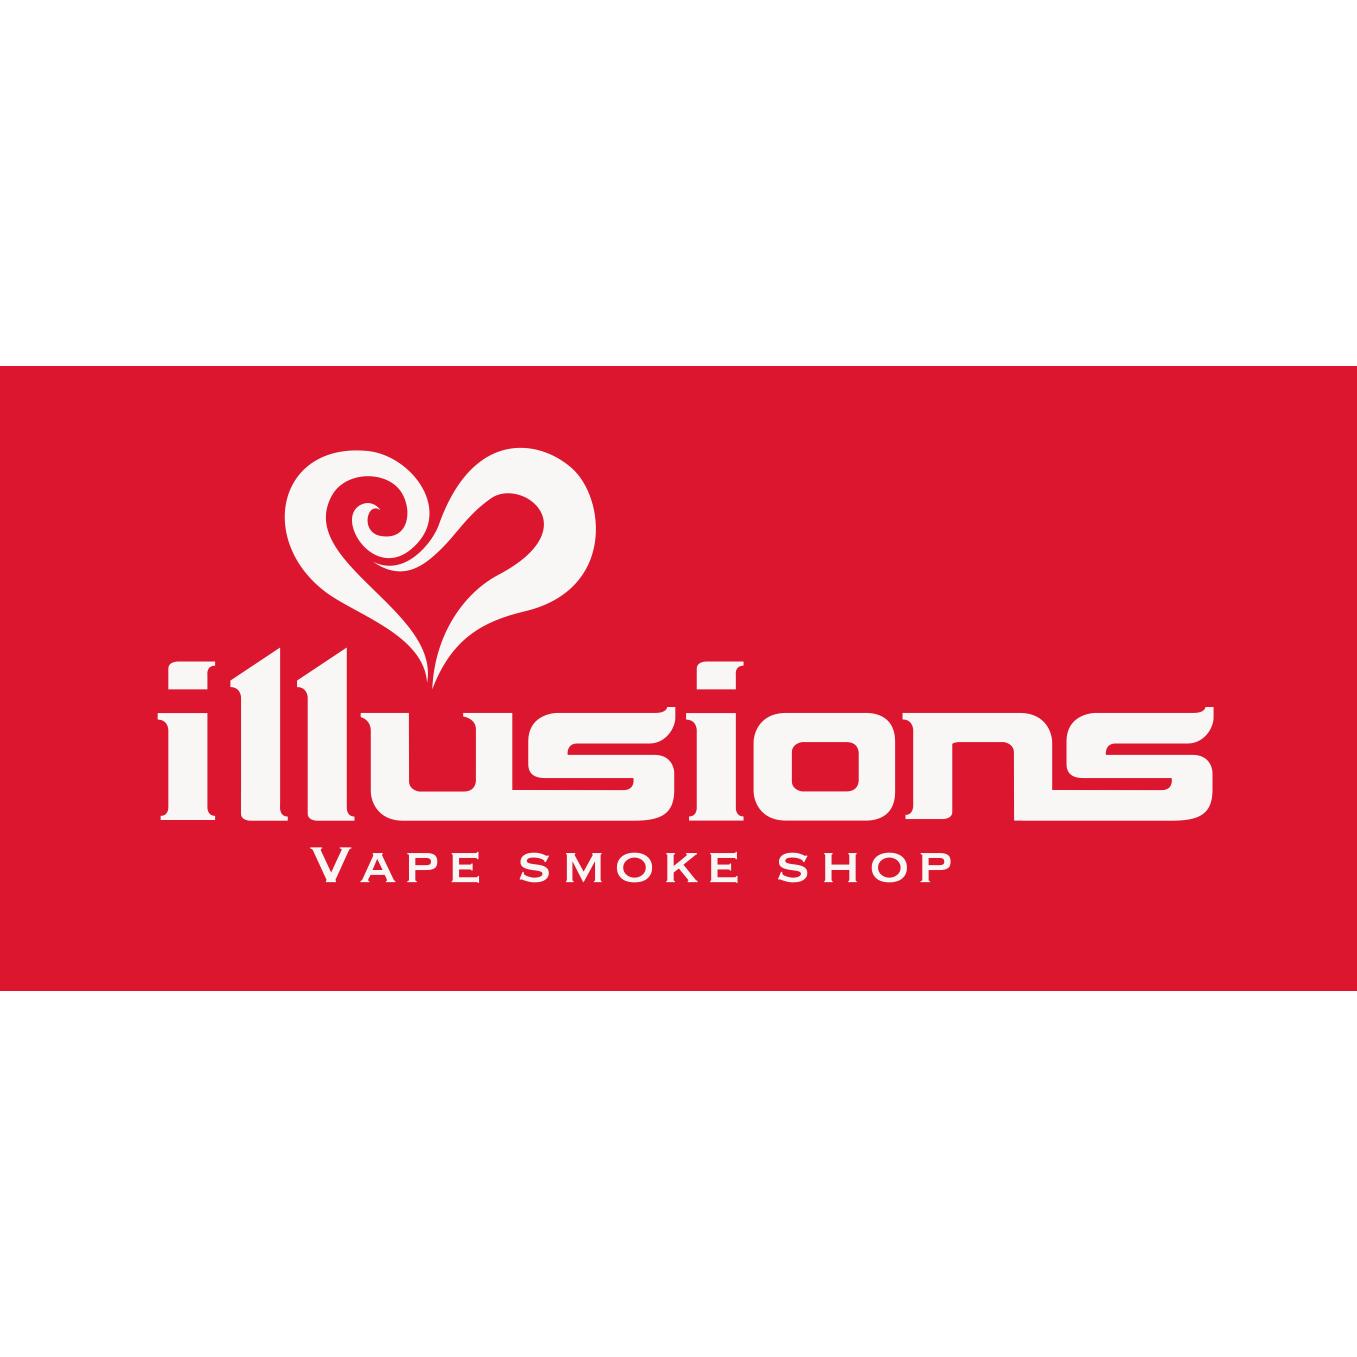 Illusions Vape Smoke Shop - San Diego, CA - Tobacco Shops